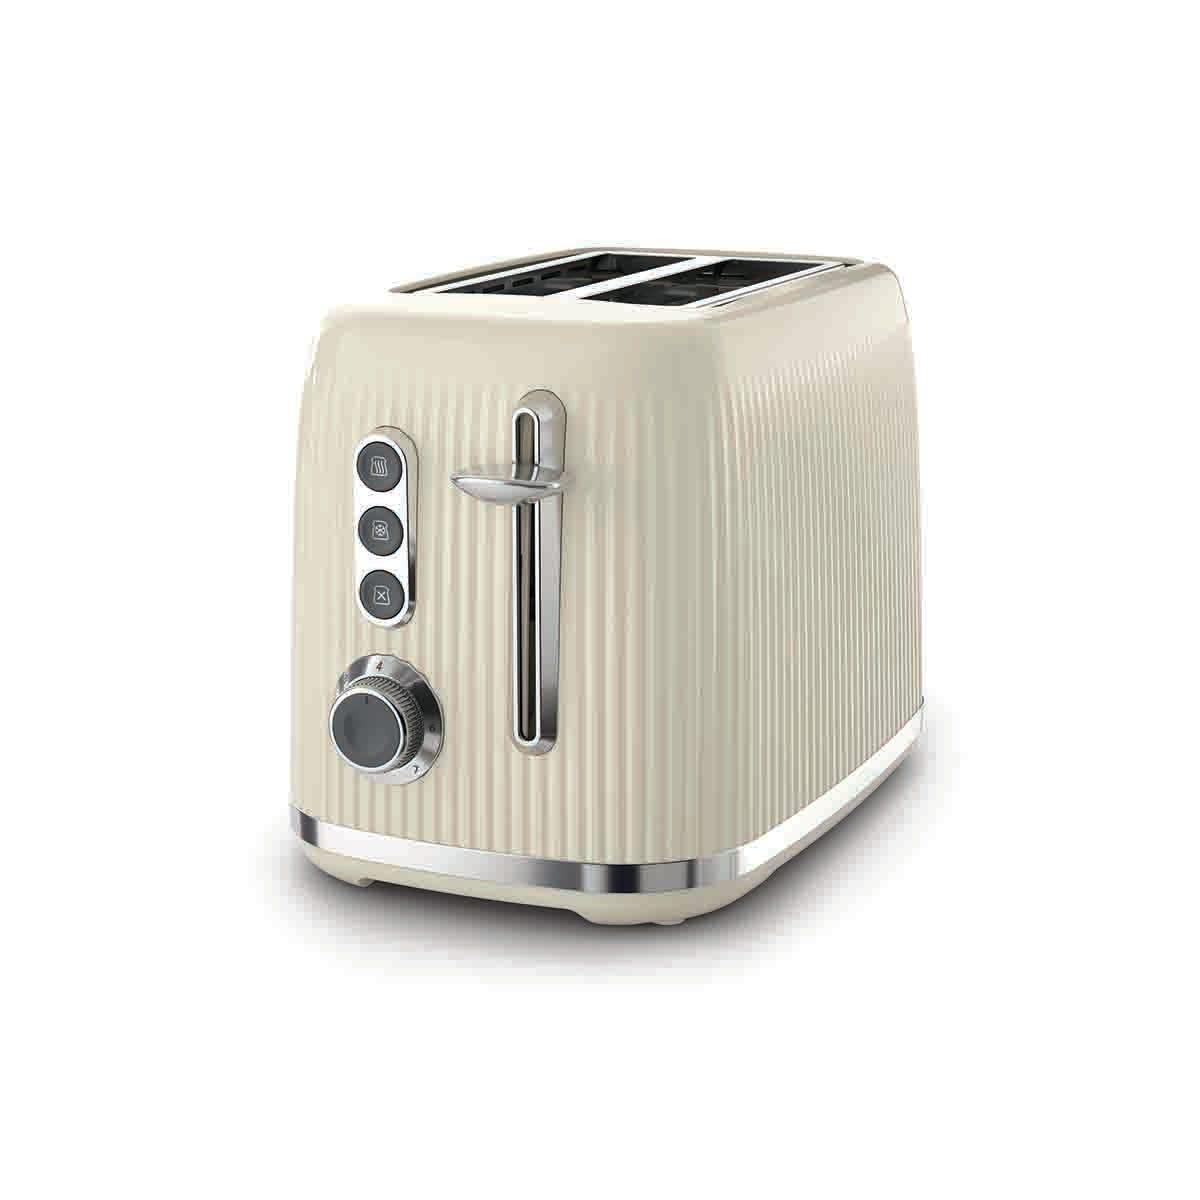 Breville VTR003 Bold 2-Slice Textured Plastic Toaster - Cream